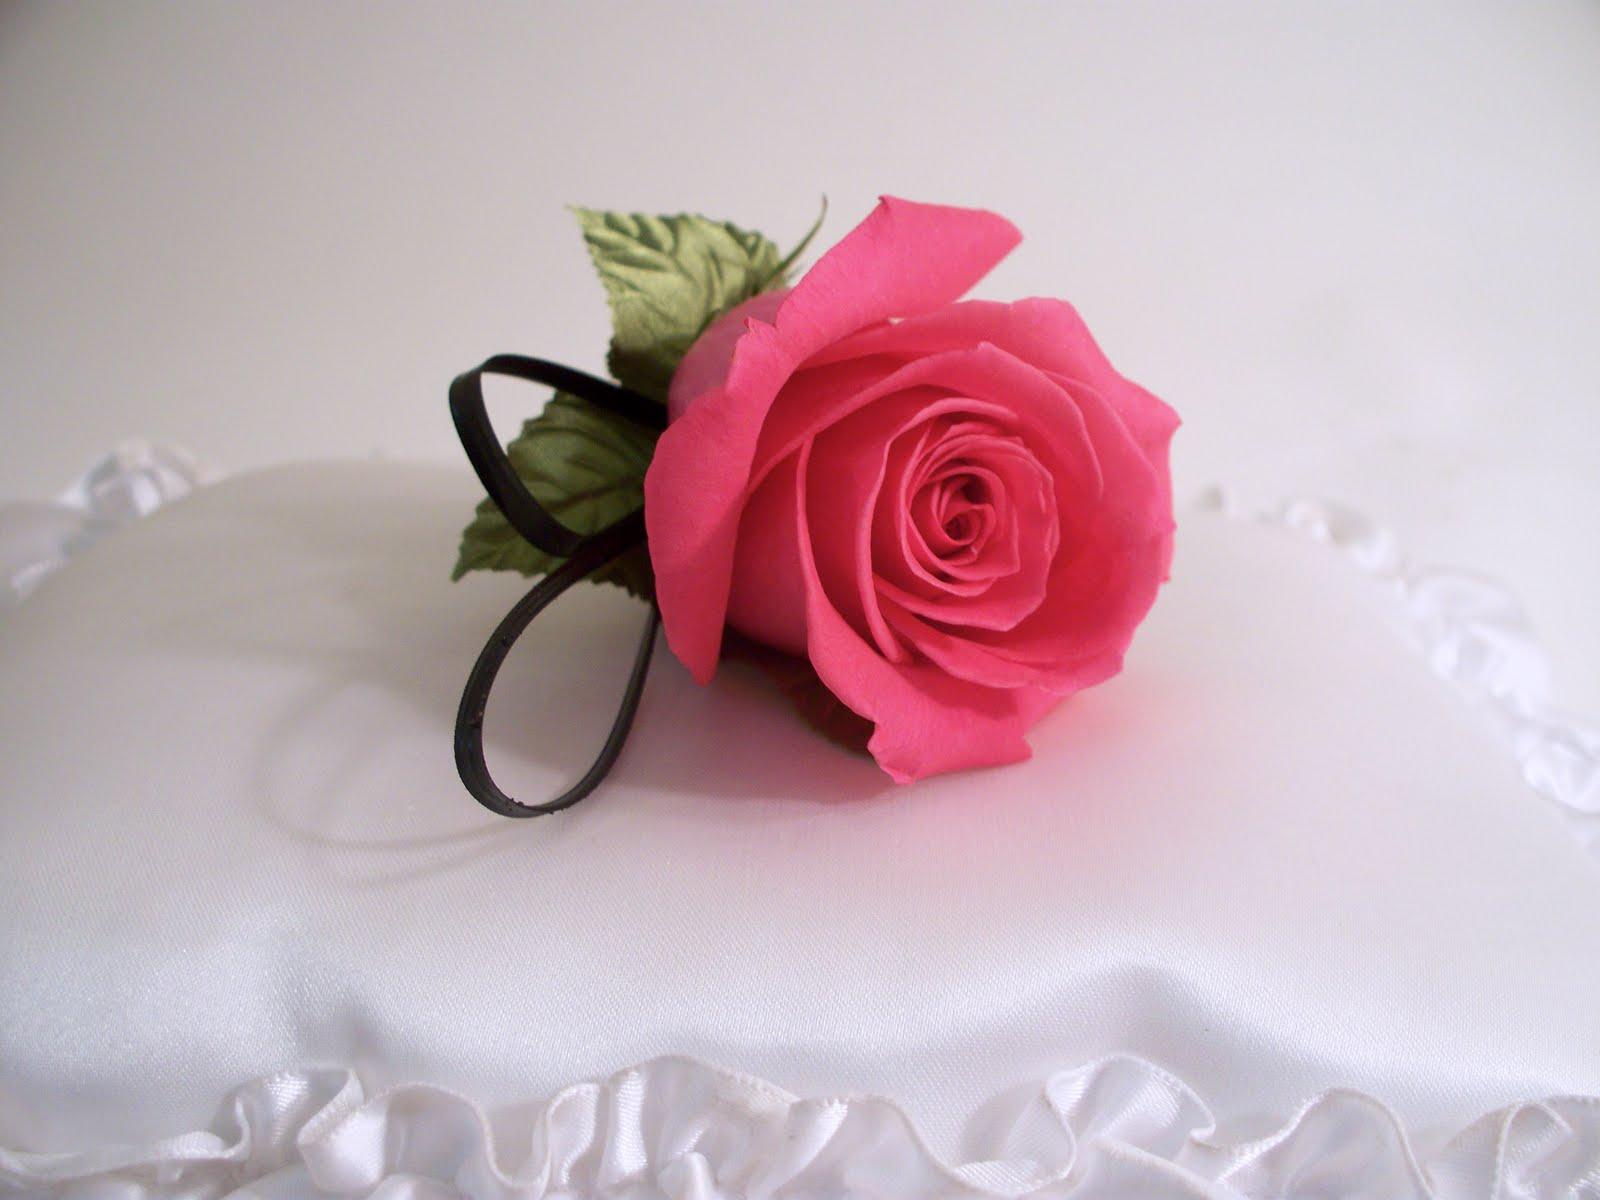 Aba\'s blog: sample wedding programs